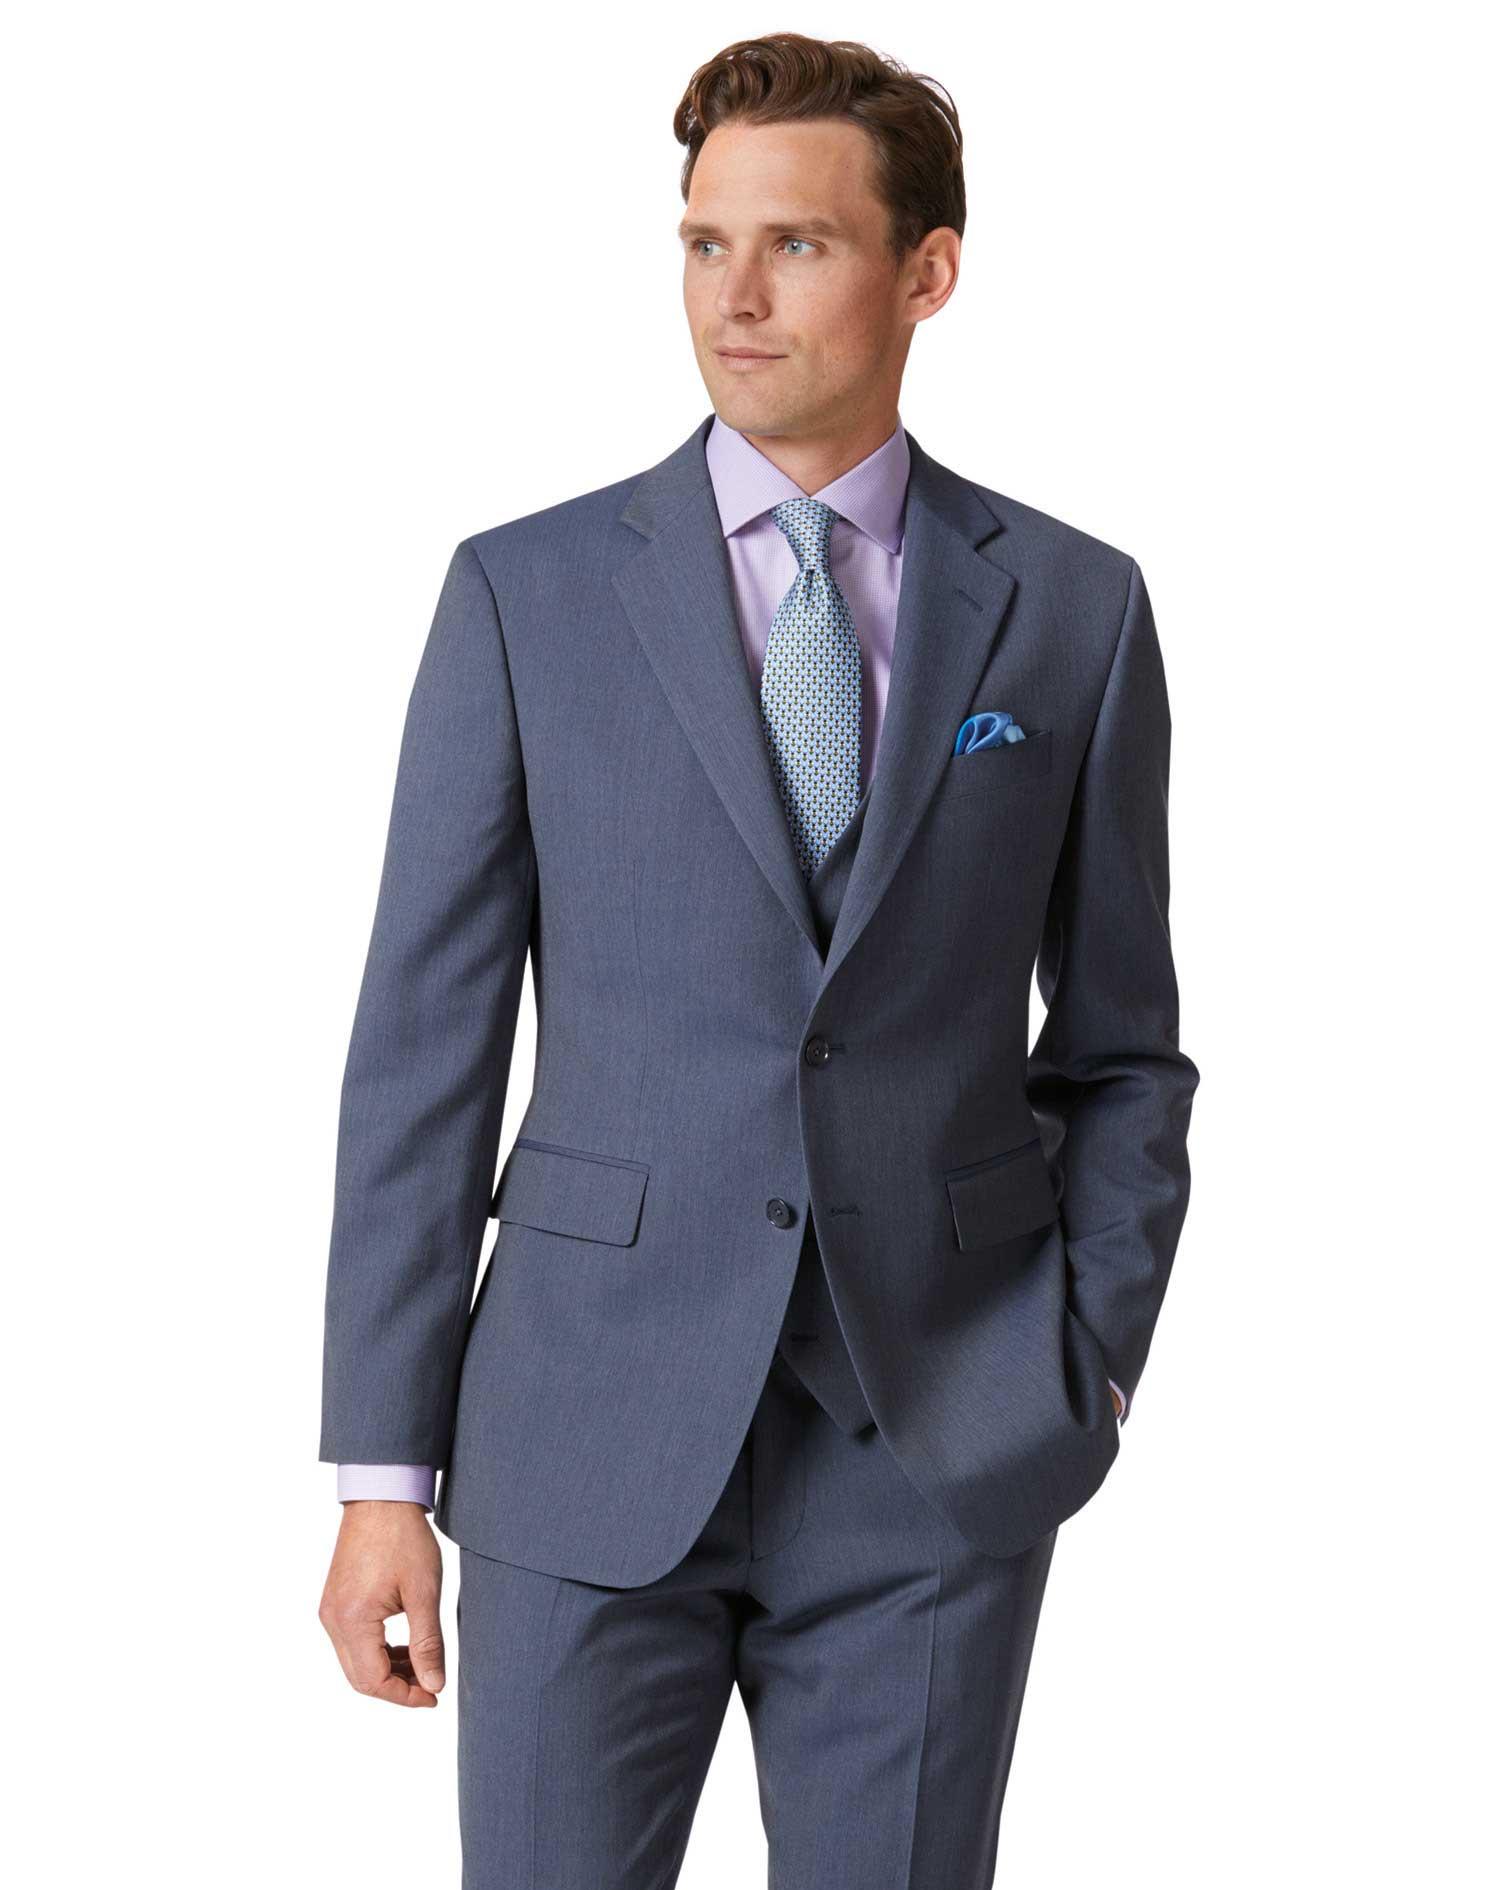 Light Blue Slim Fit Herringbone Business Suit Wool Jacket Size 42 Long by Charles Tyrwhitt